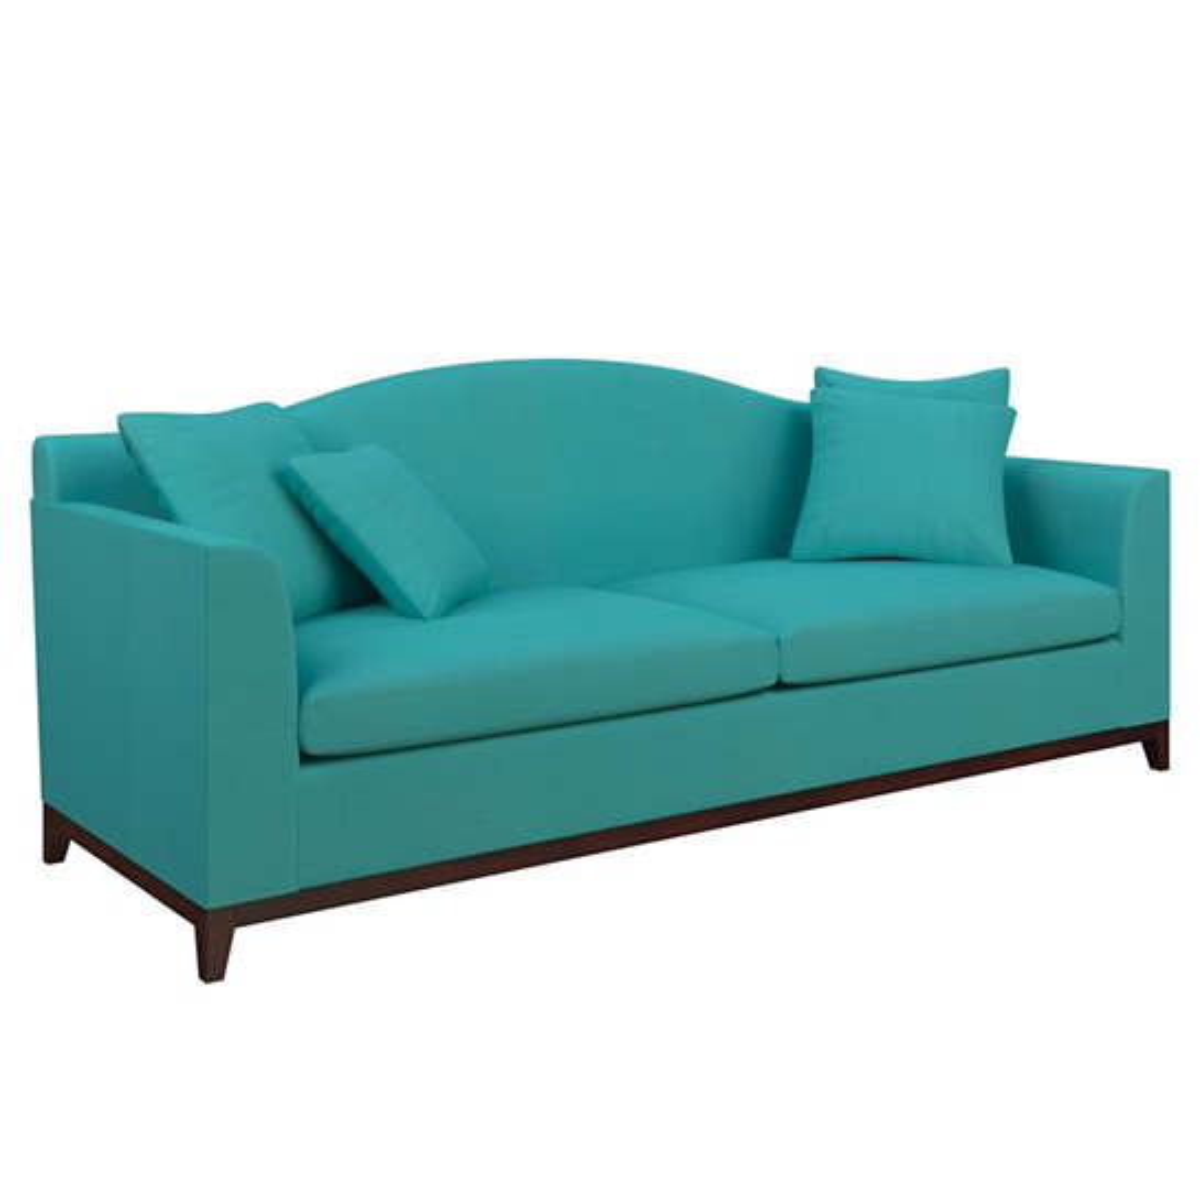 Estate Linen Turquoise Marseille Sofa